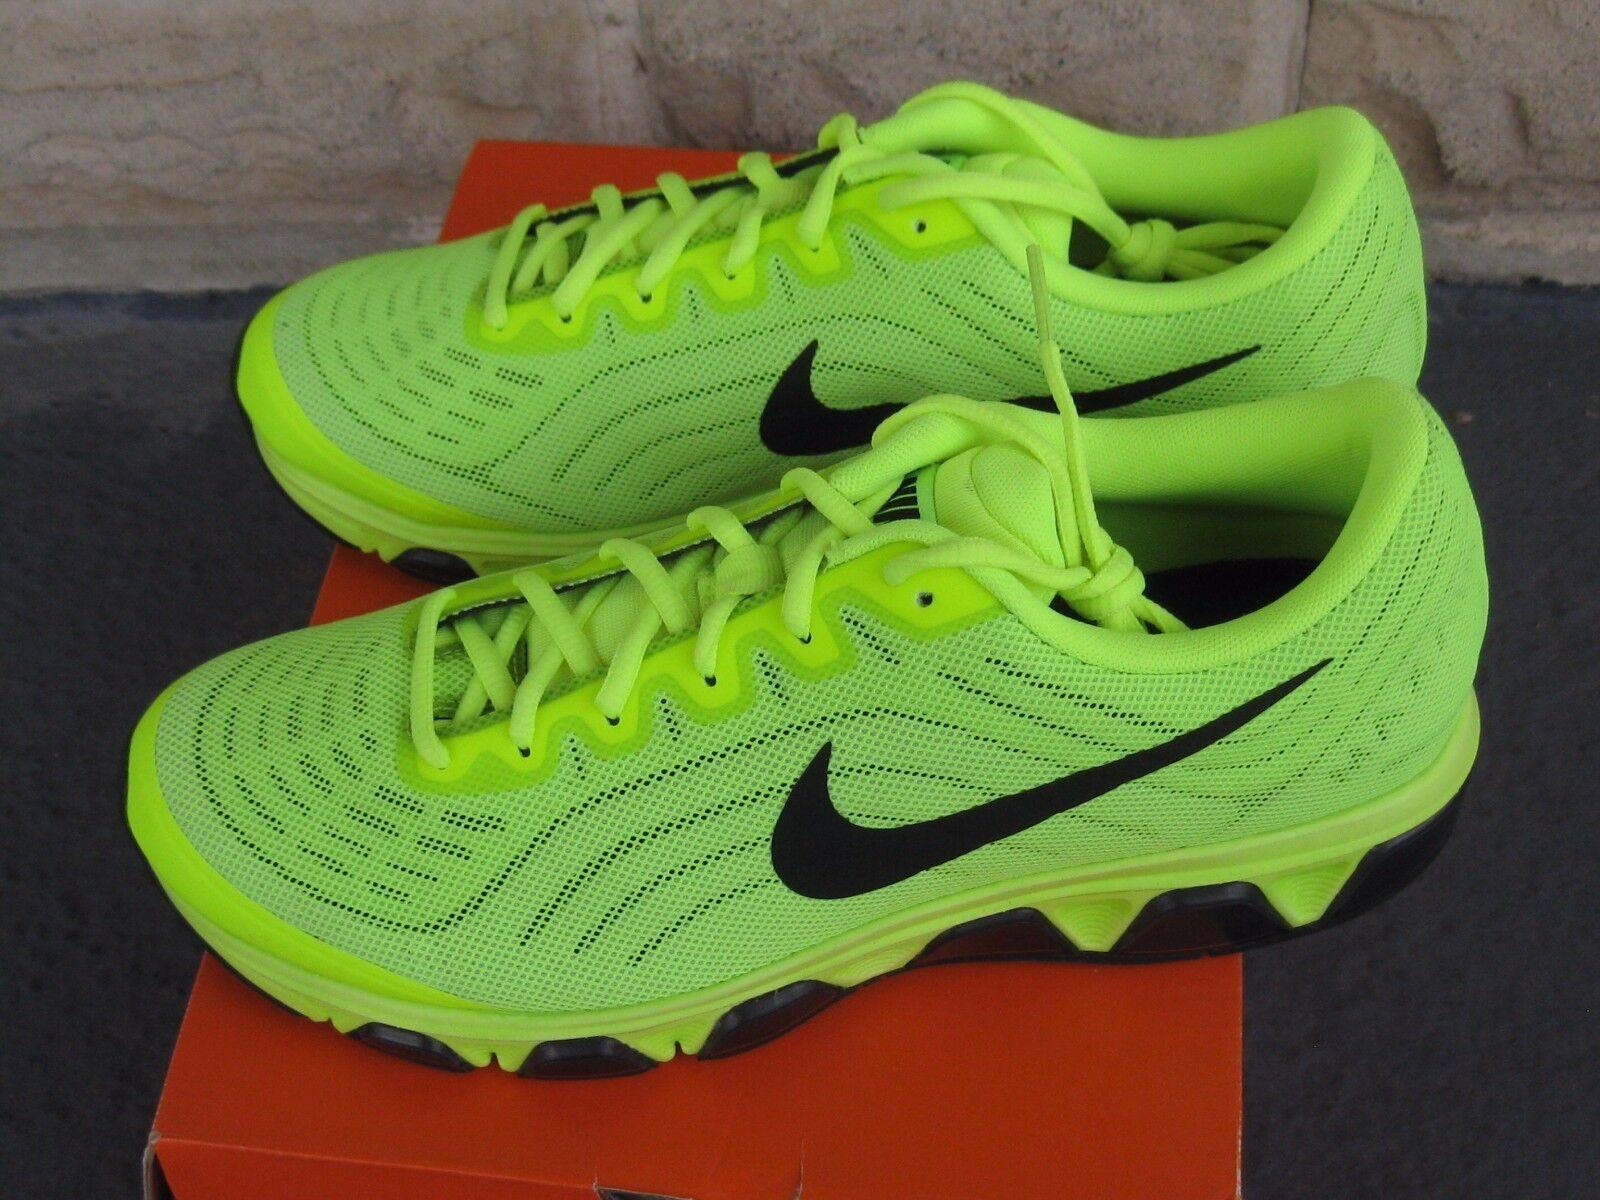 Nike air max spinta 6 heron 621225 700 gr 44 10 neu!!